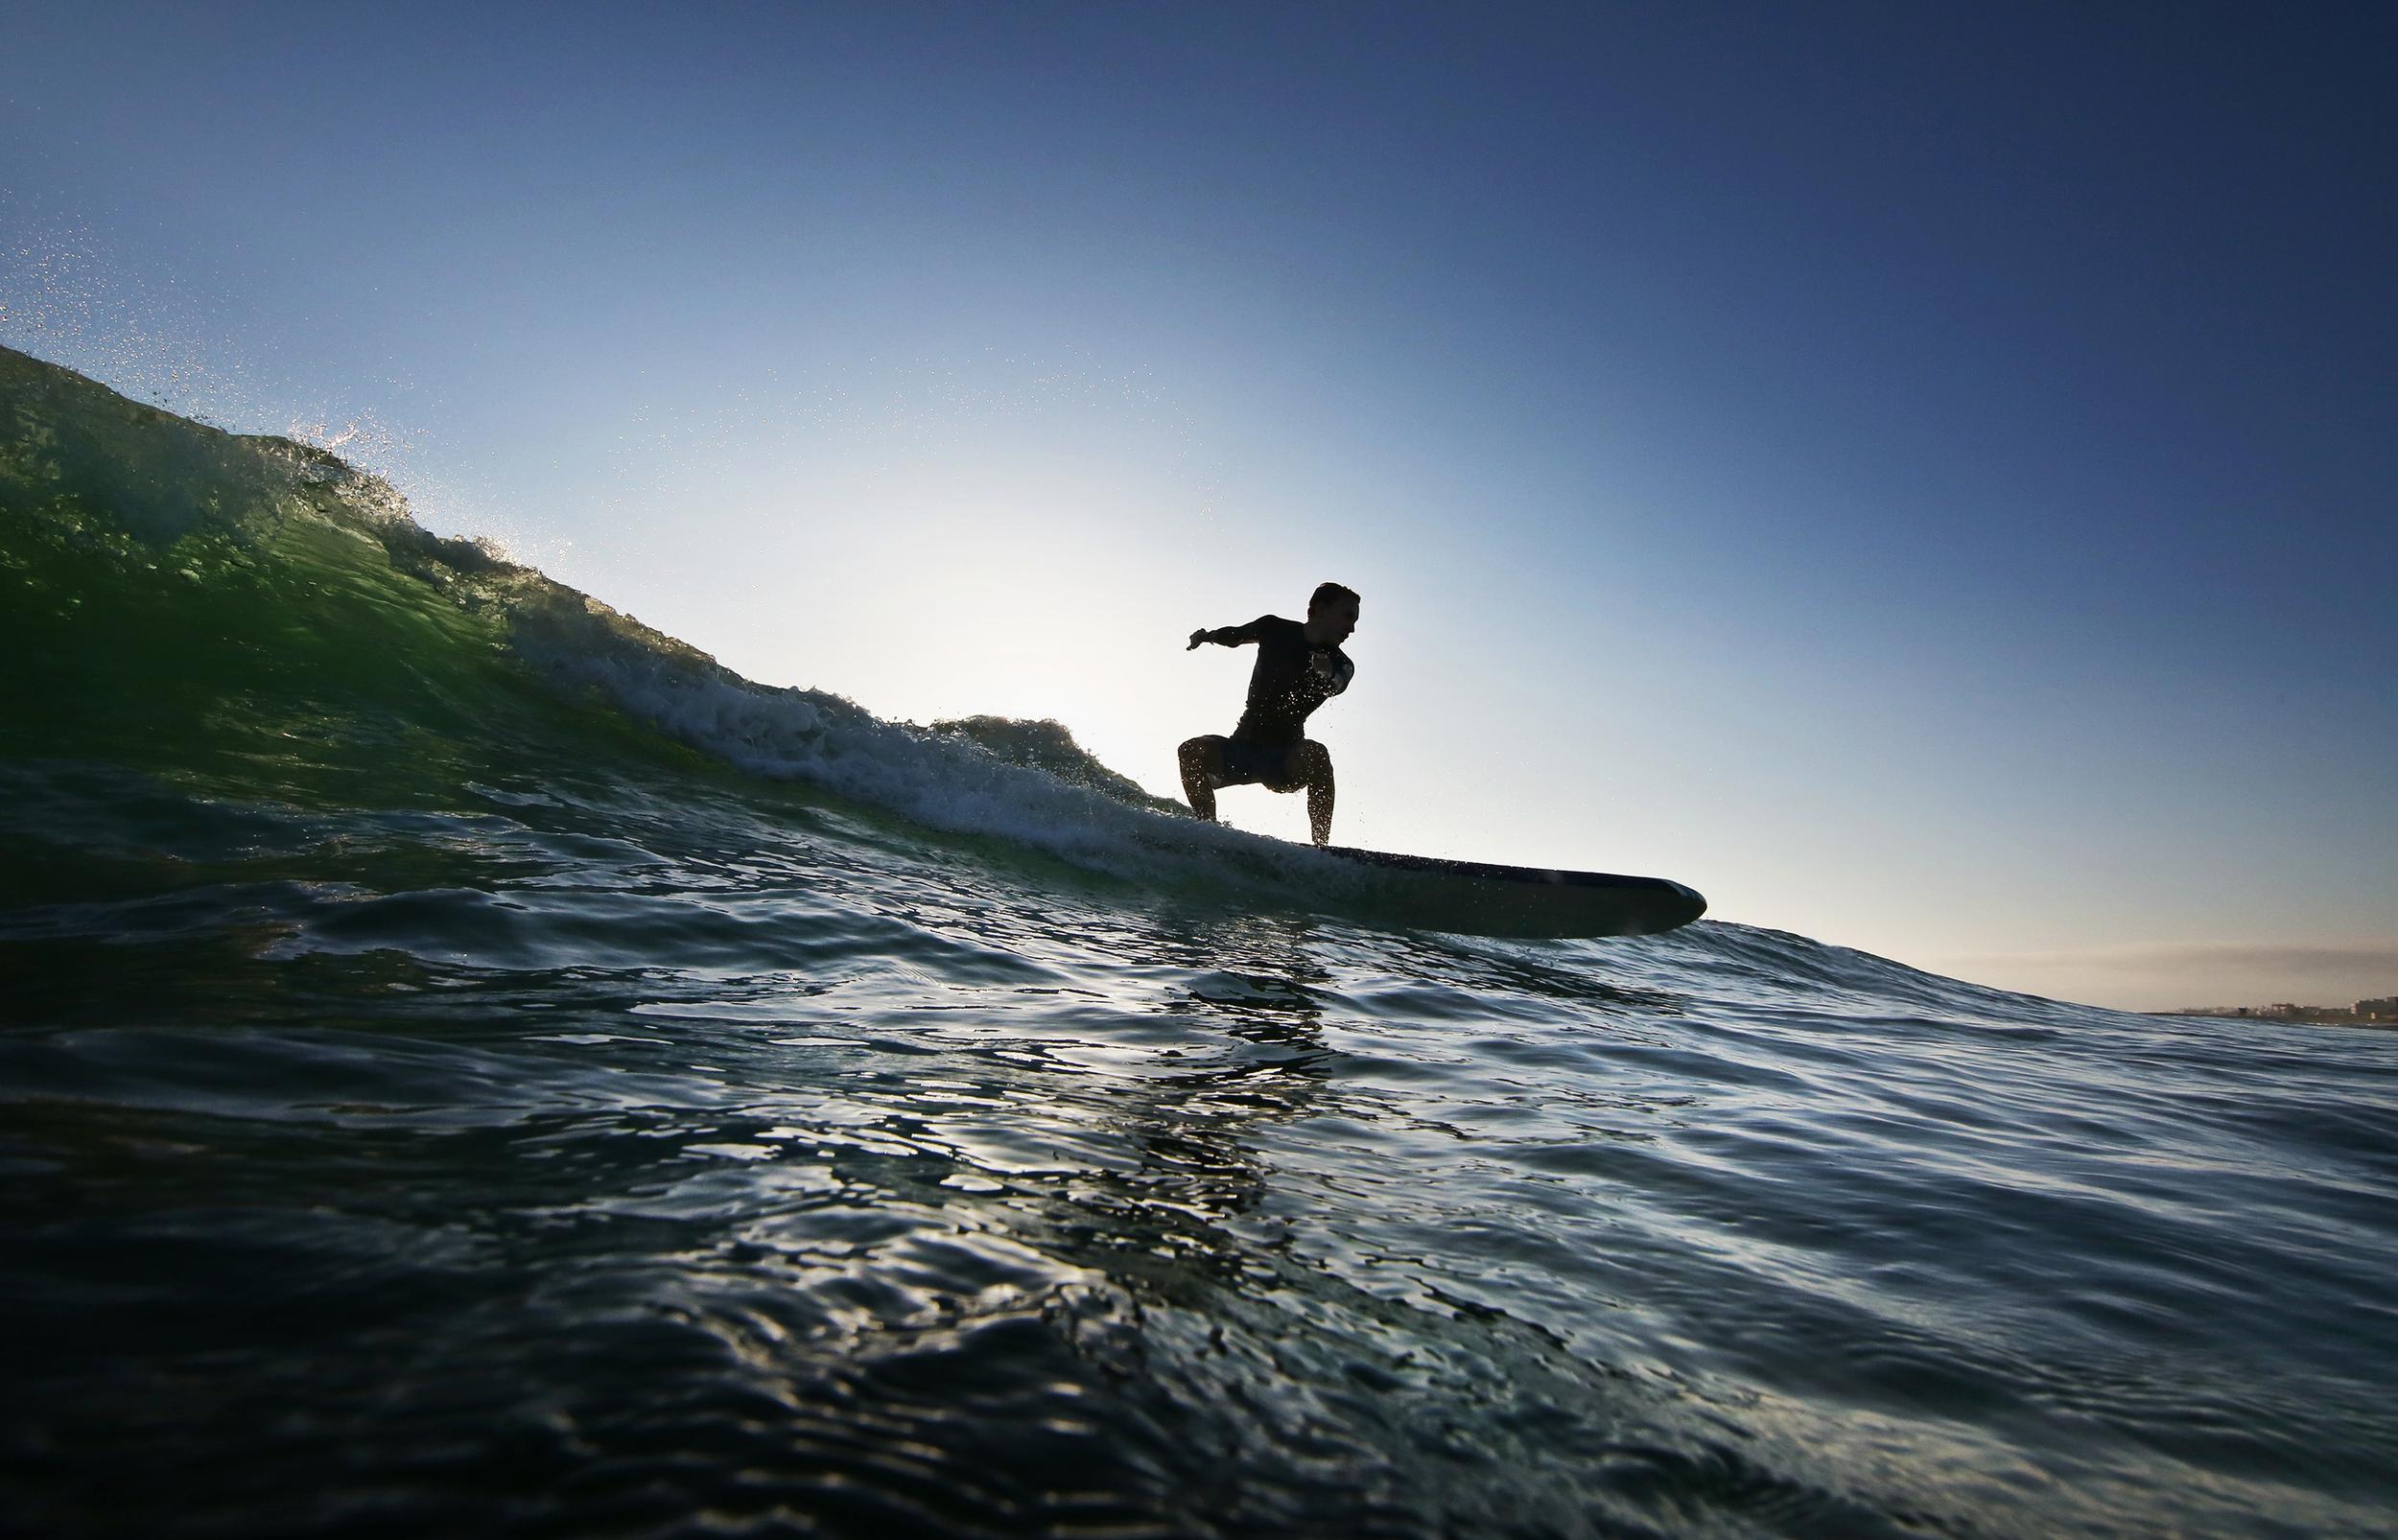 LongboarderSilouetteDropIn01small.jpg